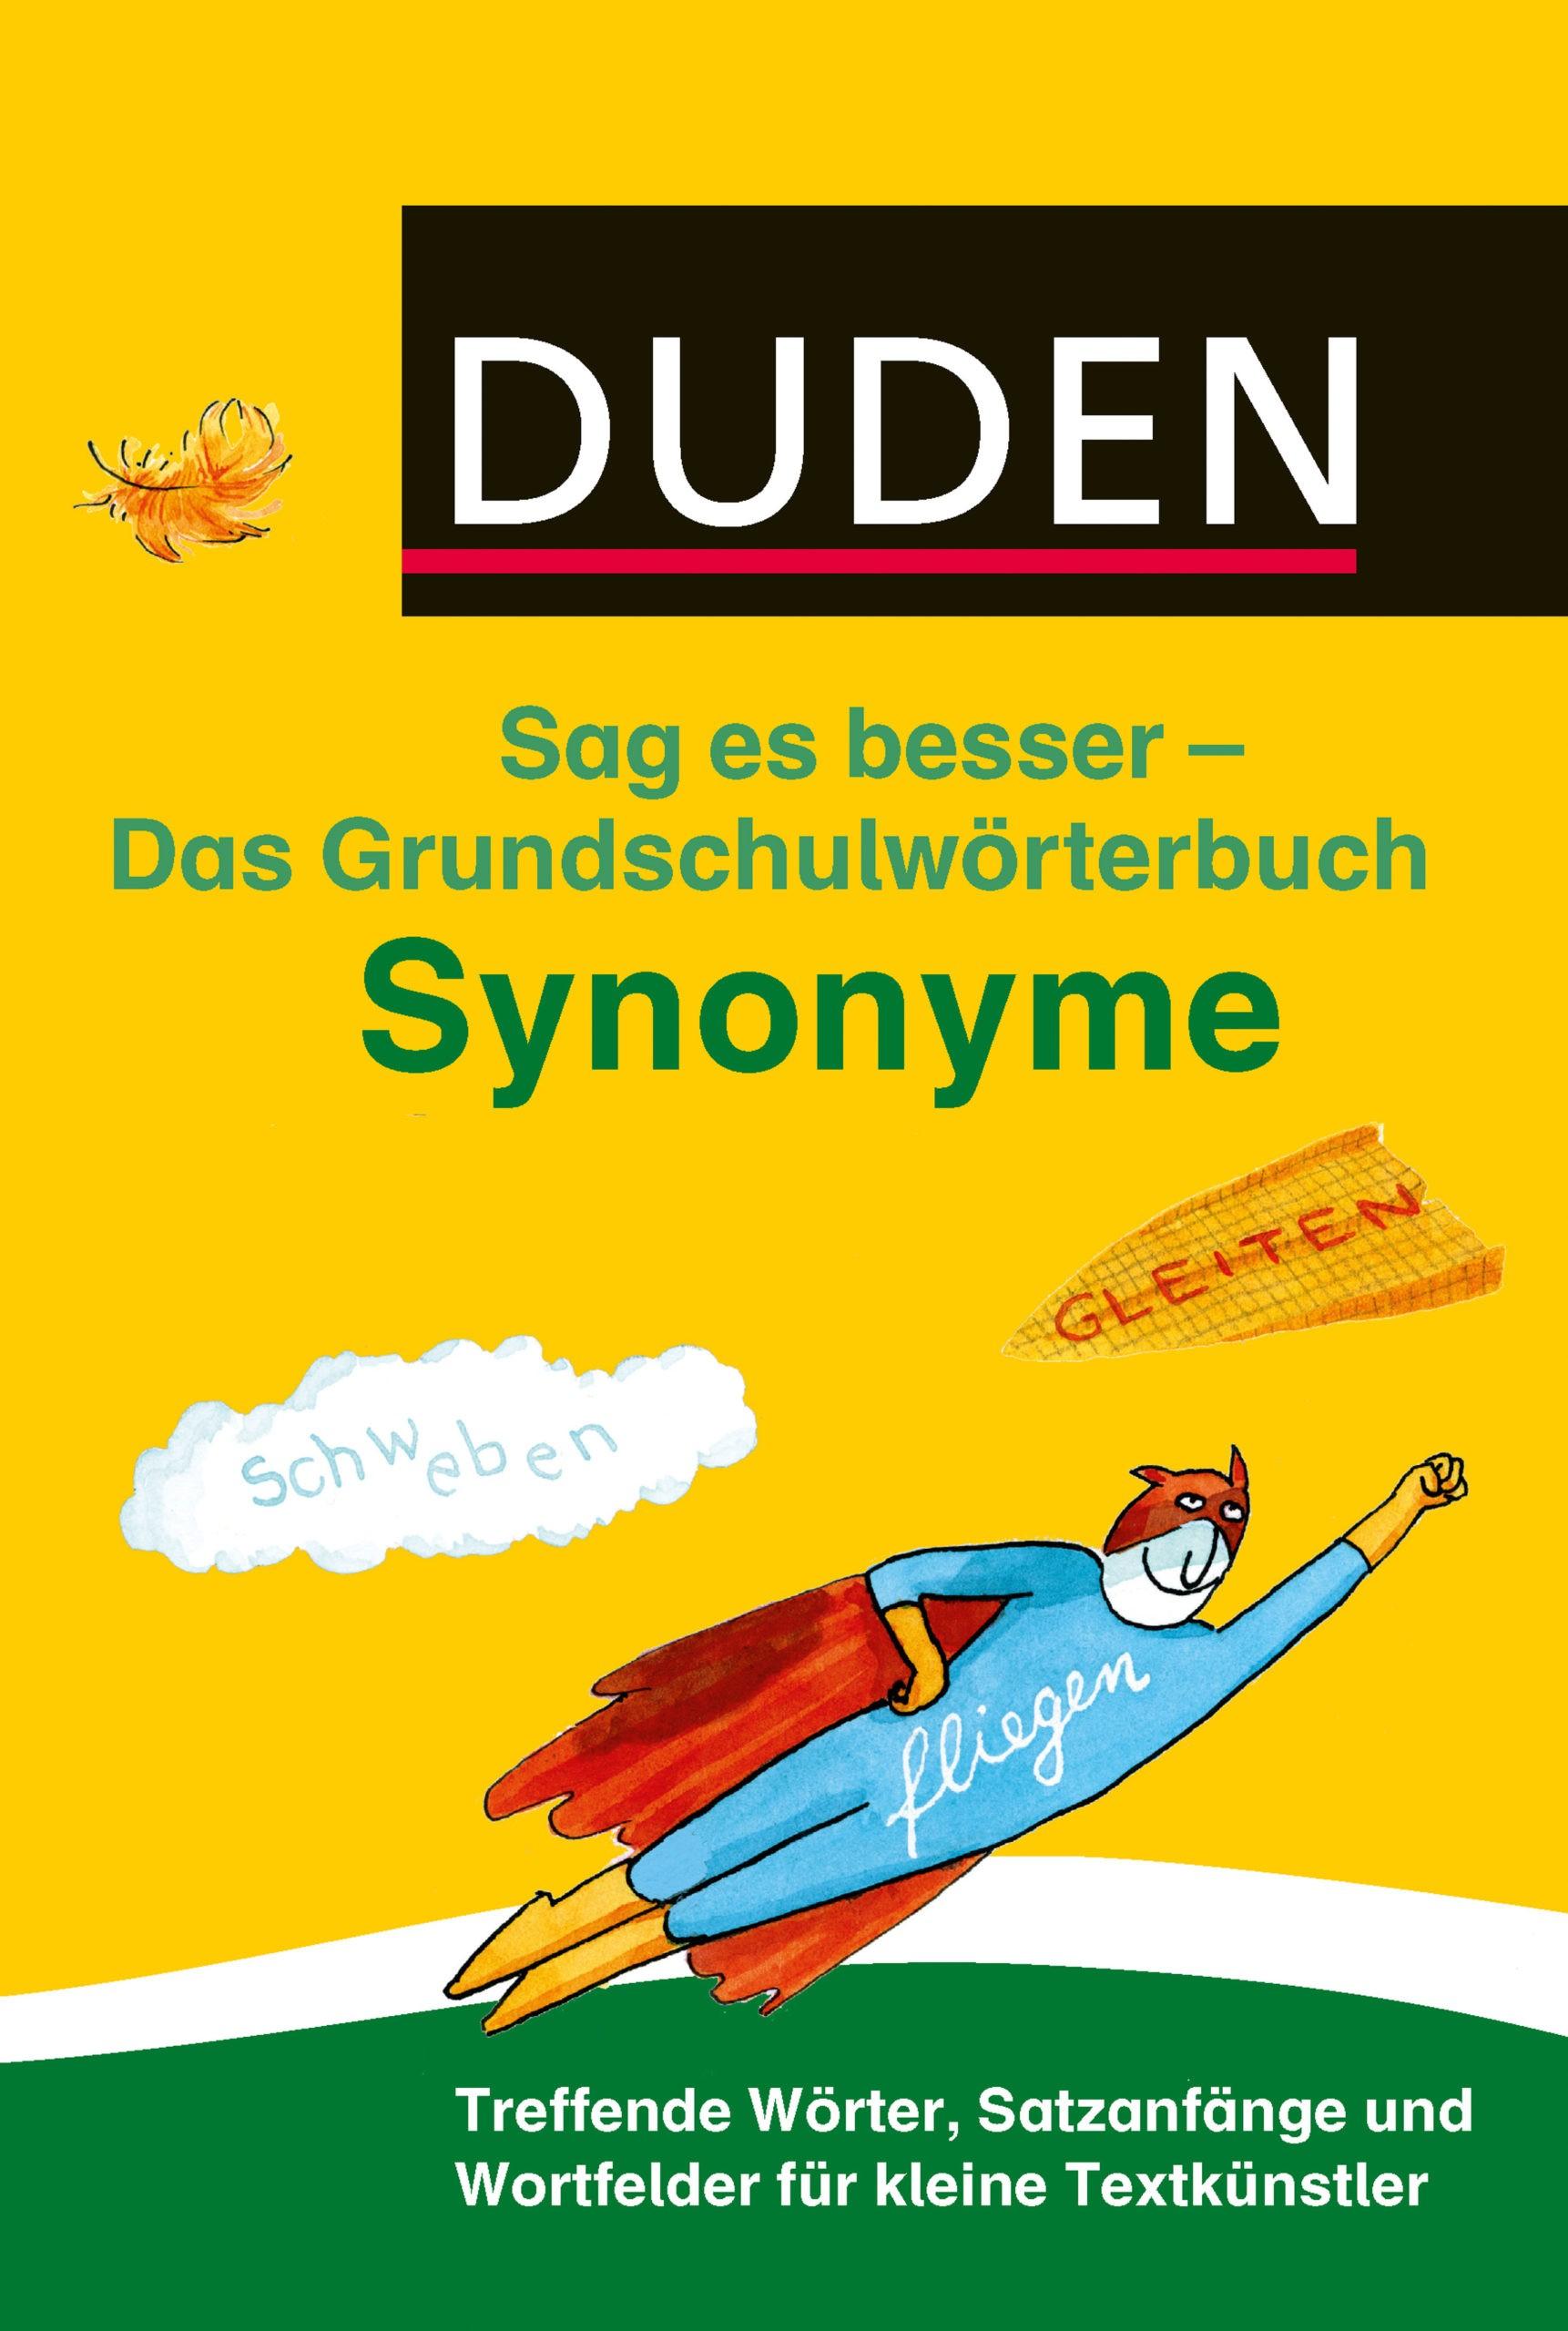 Synonyme. Das Grundschulwörterbuch – Sag es besser